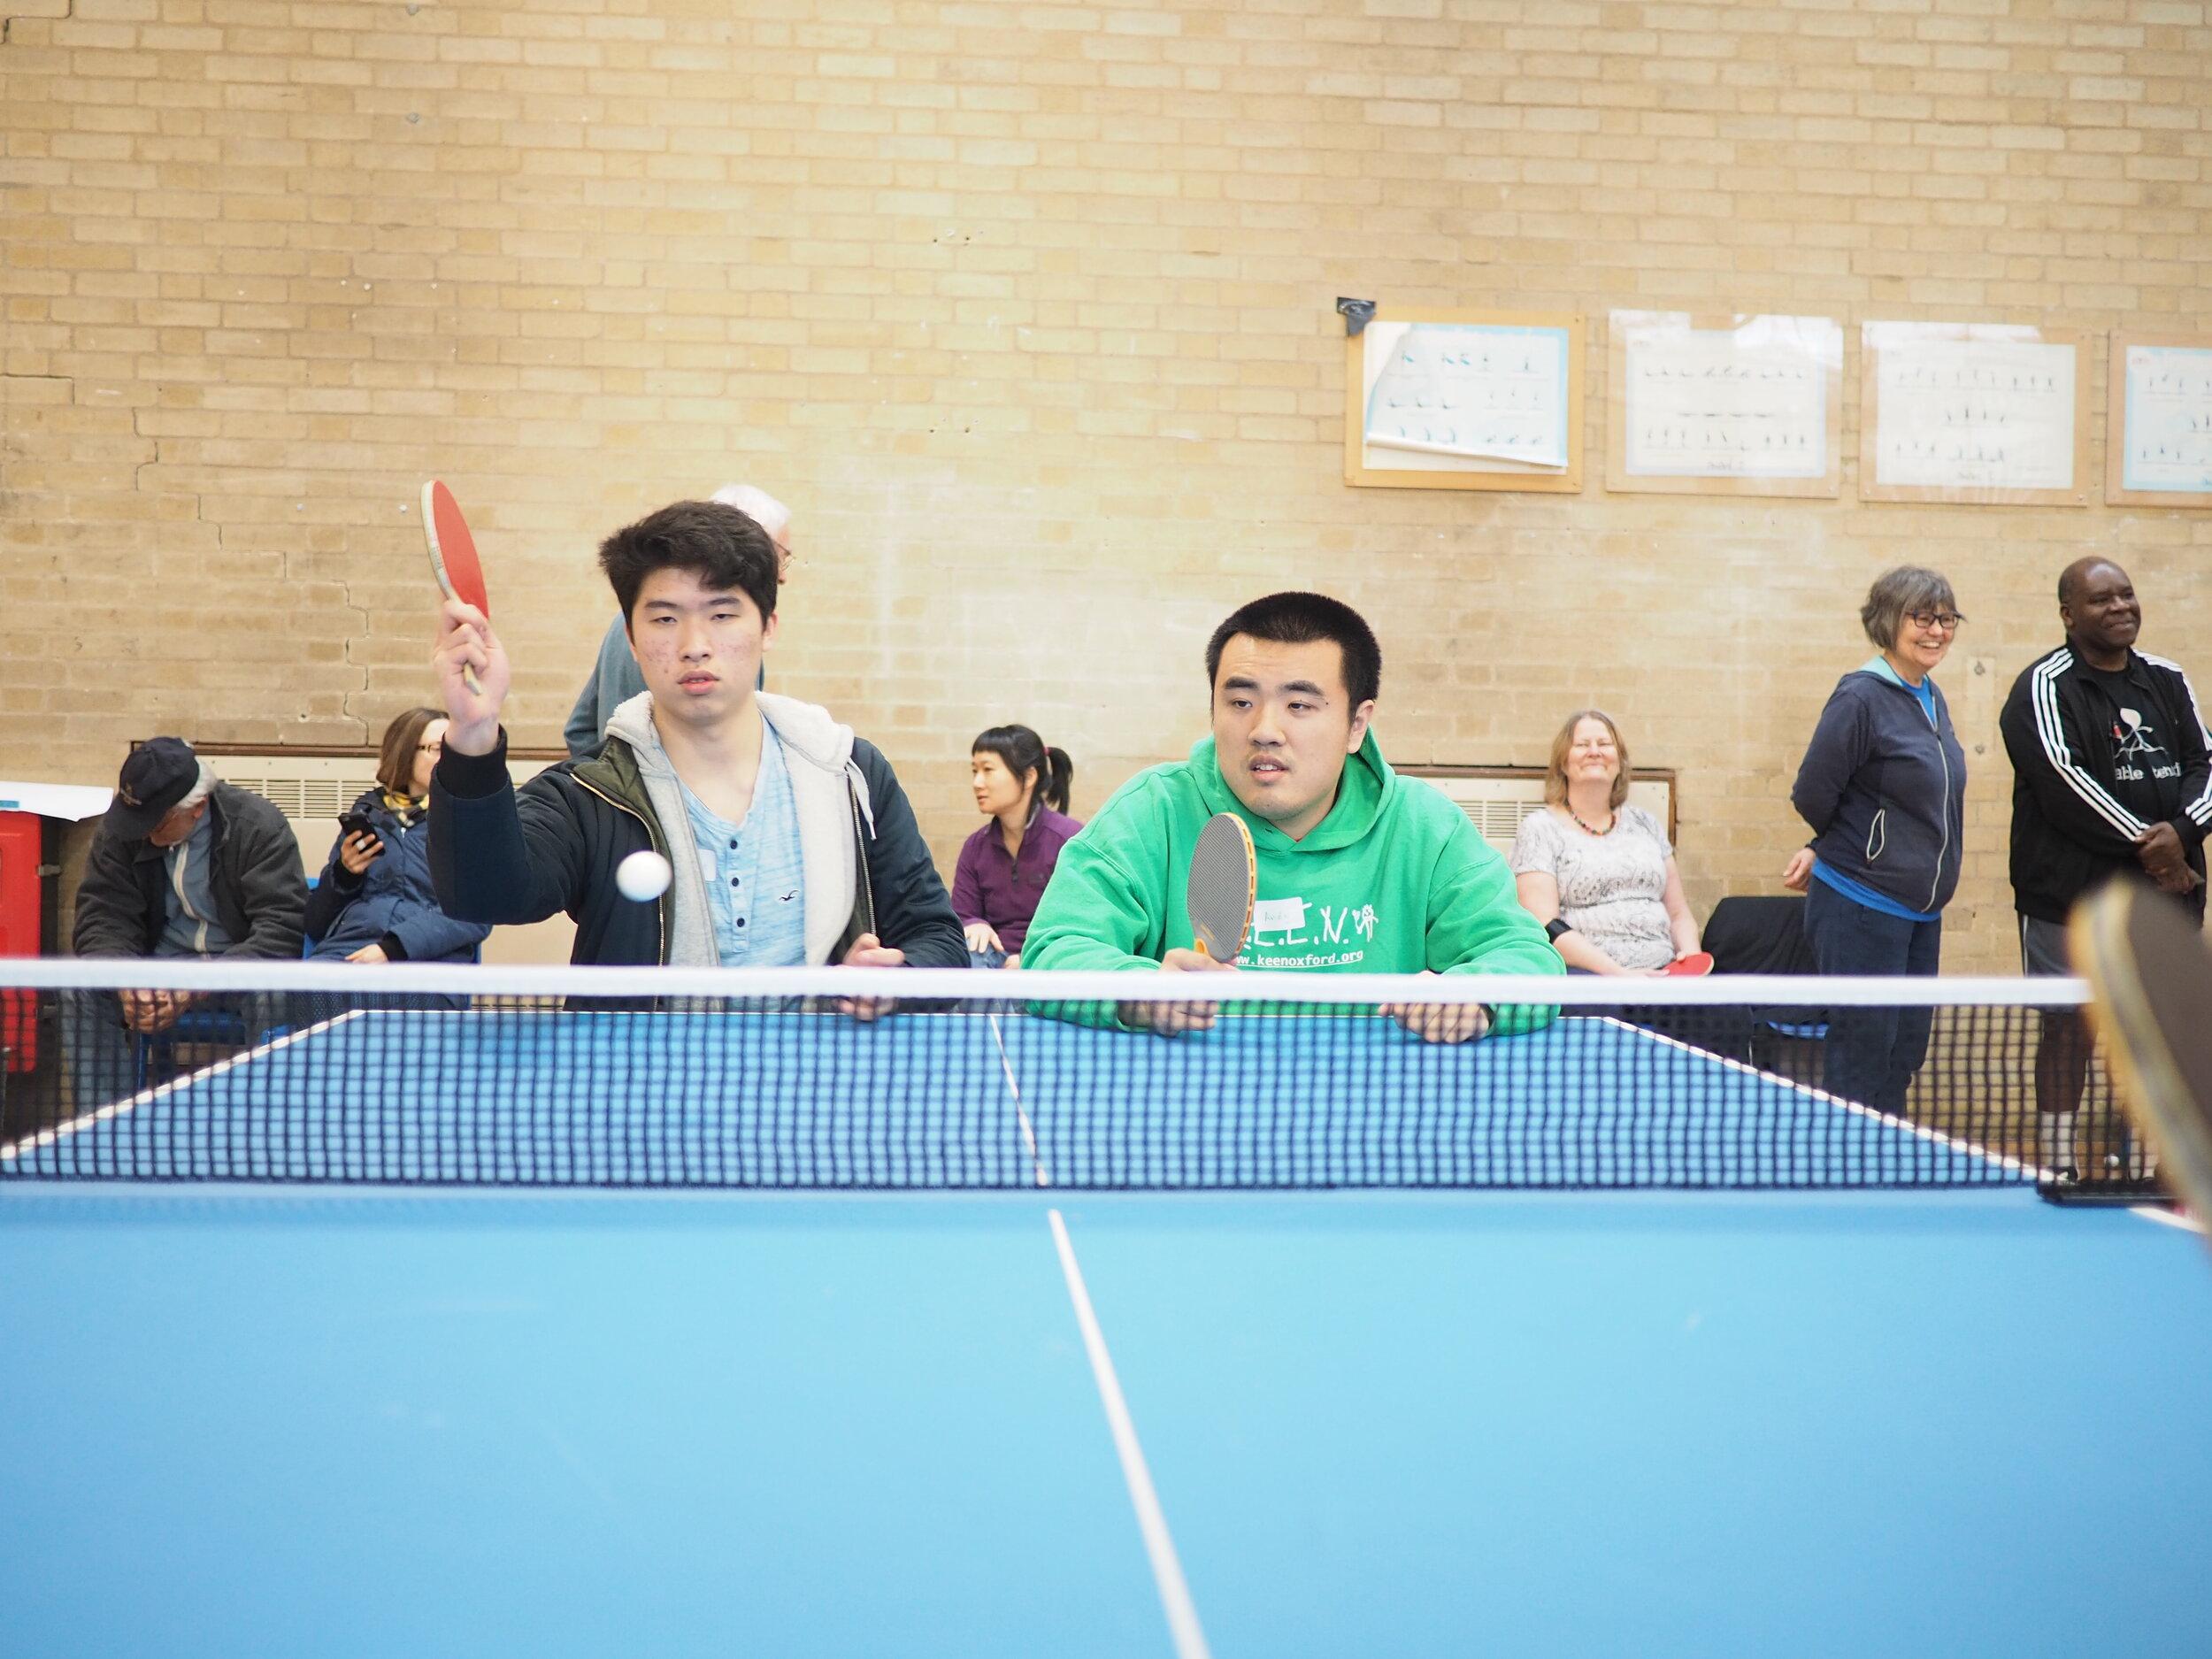 Oxford Community Table Tennis Club